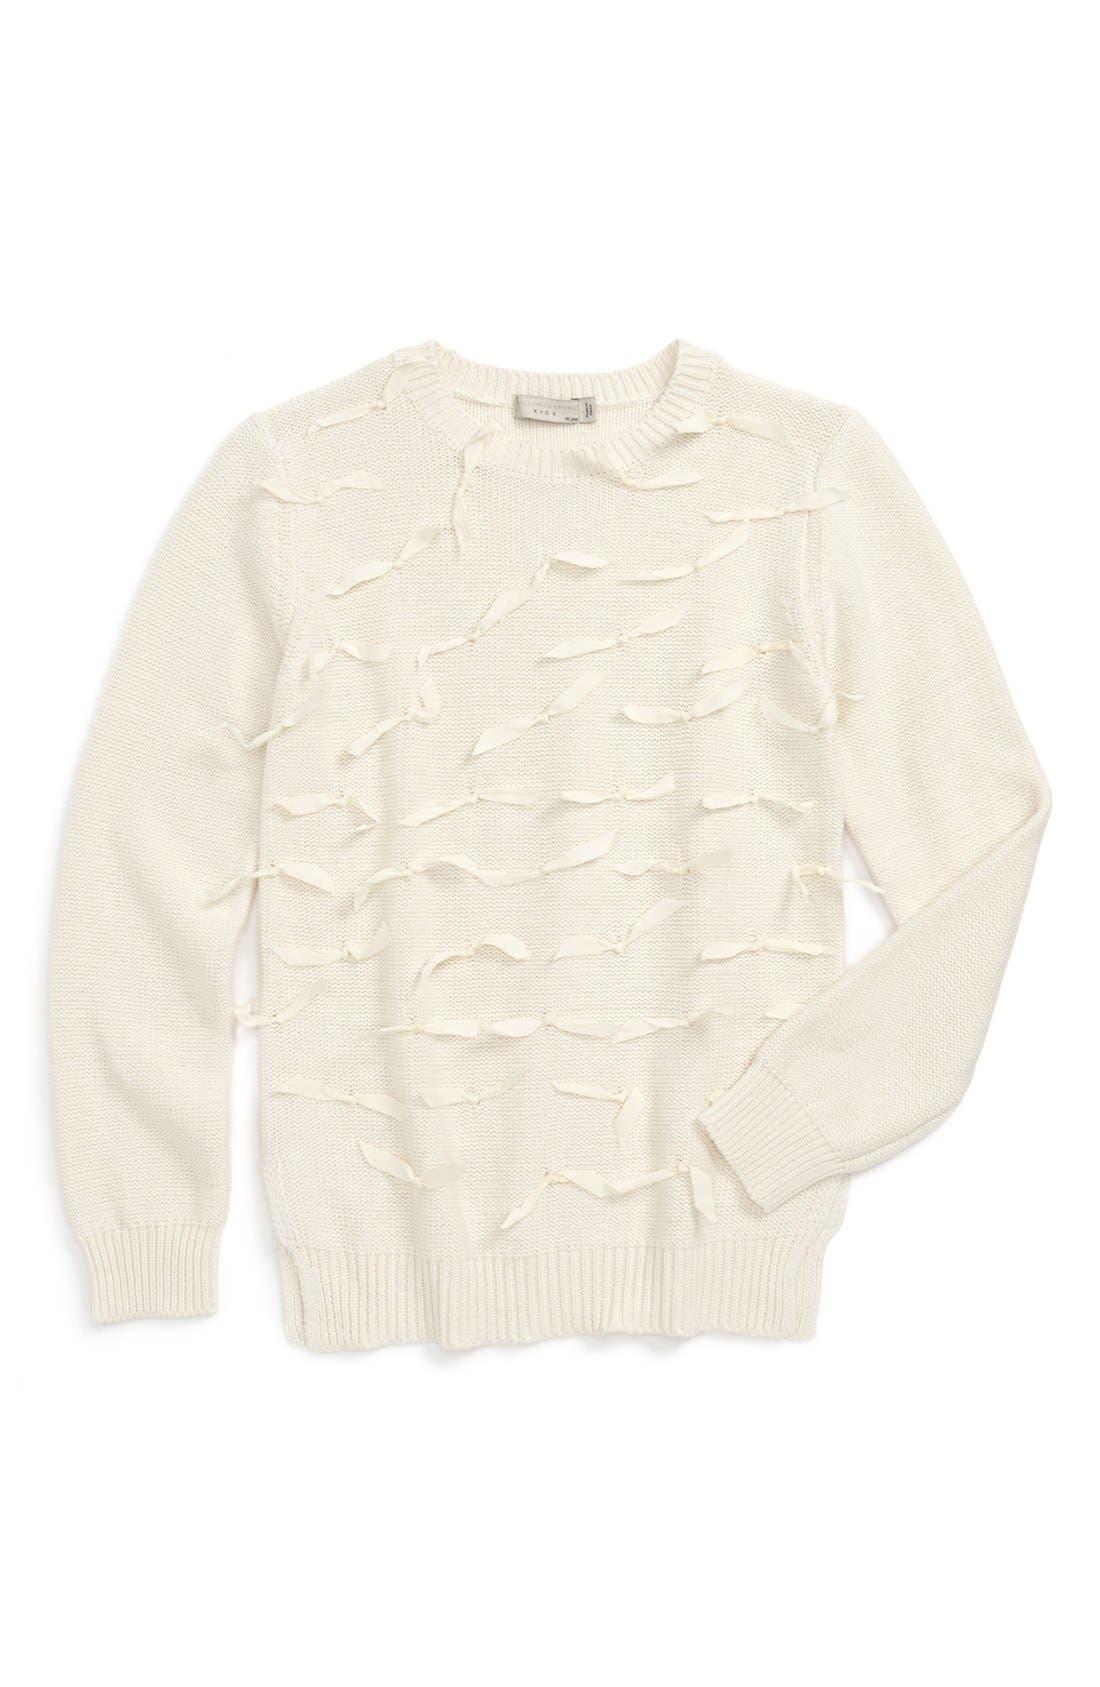 Main Image - Stella McCartney Kids 'Emily' Sweater (Little Girls & Big Girls)